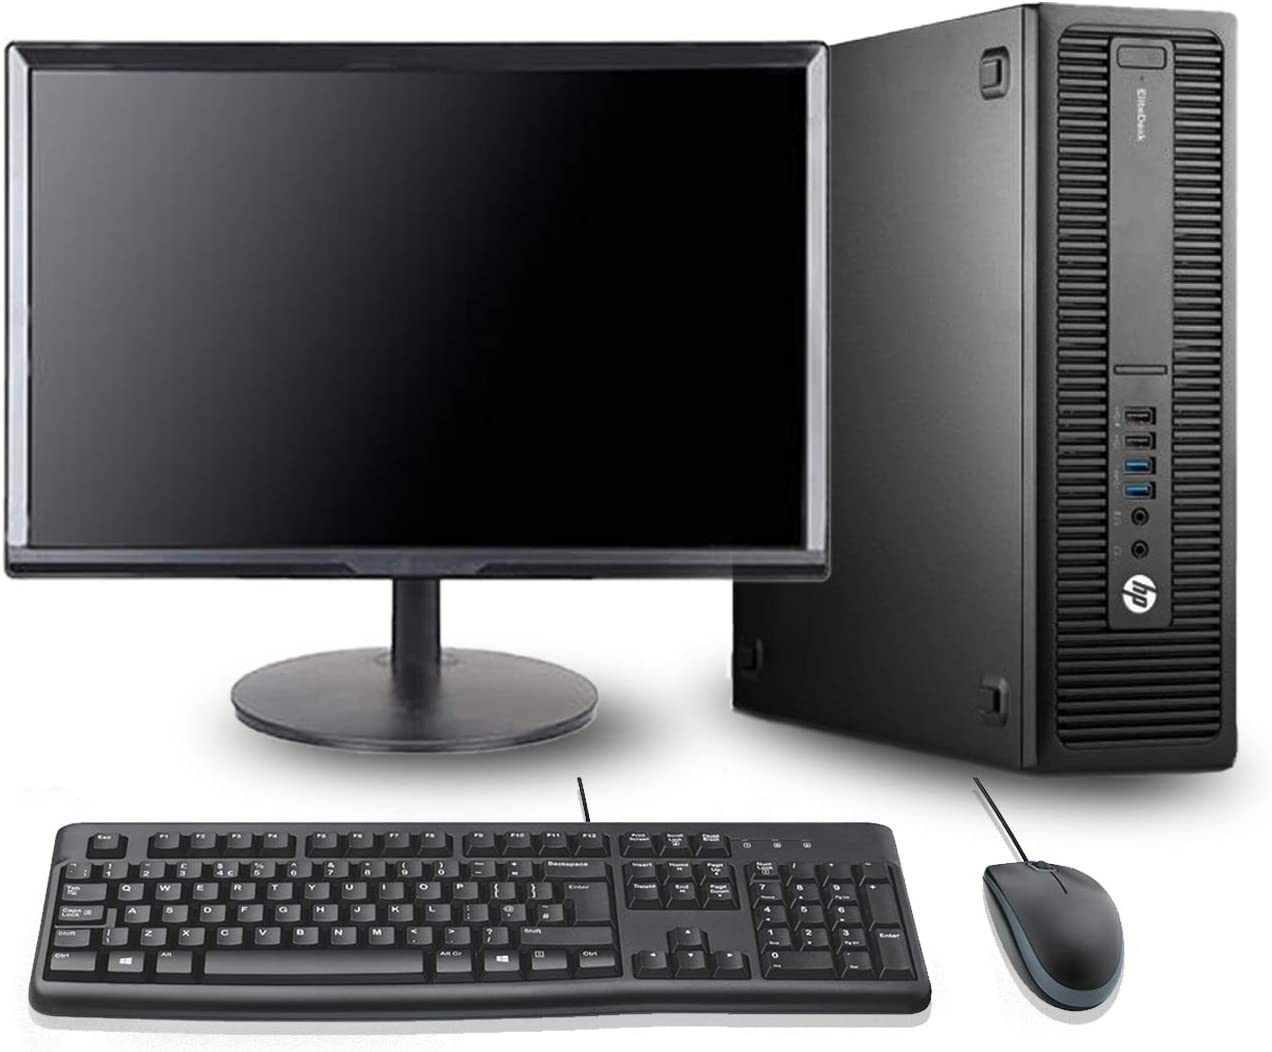 HP EliteDesk 800 G2 SFF Desktop Computer 24 Inch FHD Monitor Dual Hard Drive PC(Intel i5-6500 Up to 3.6GHz, 8GB RAM, 128GB SSD + 1TB HDD, WiFi, HDMI, Windows 10 Professional) (Renewed)